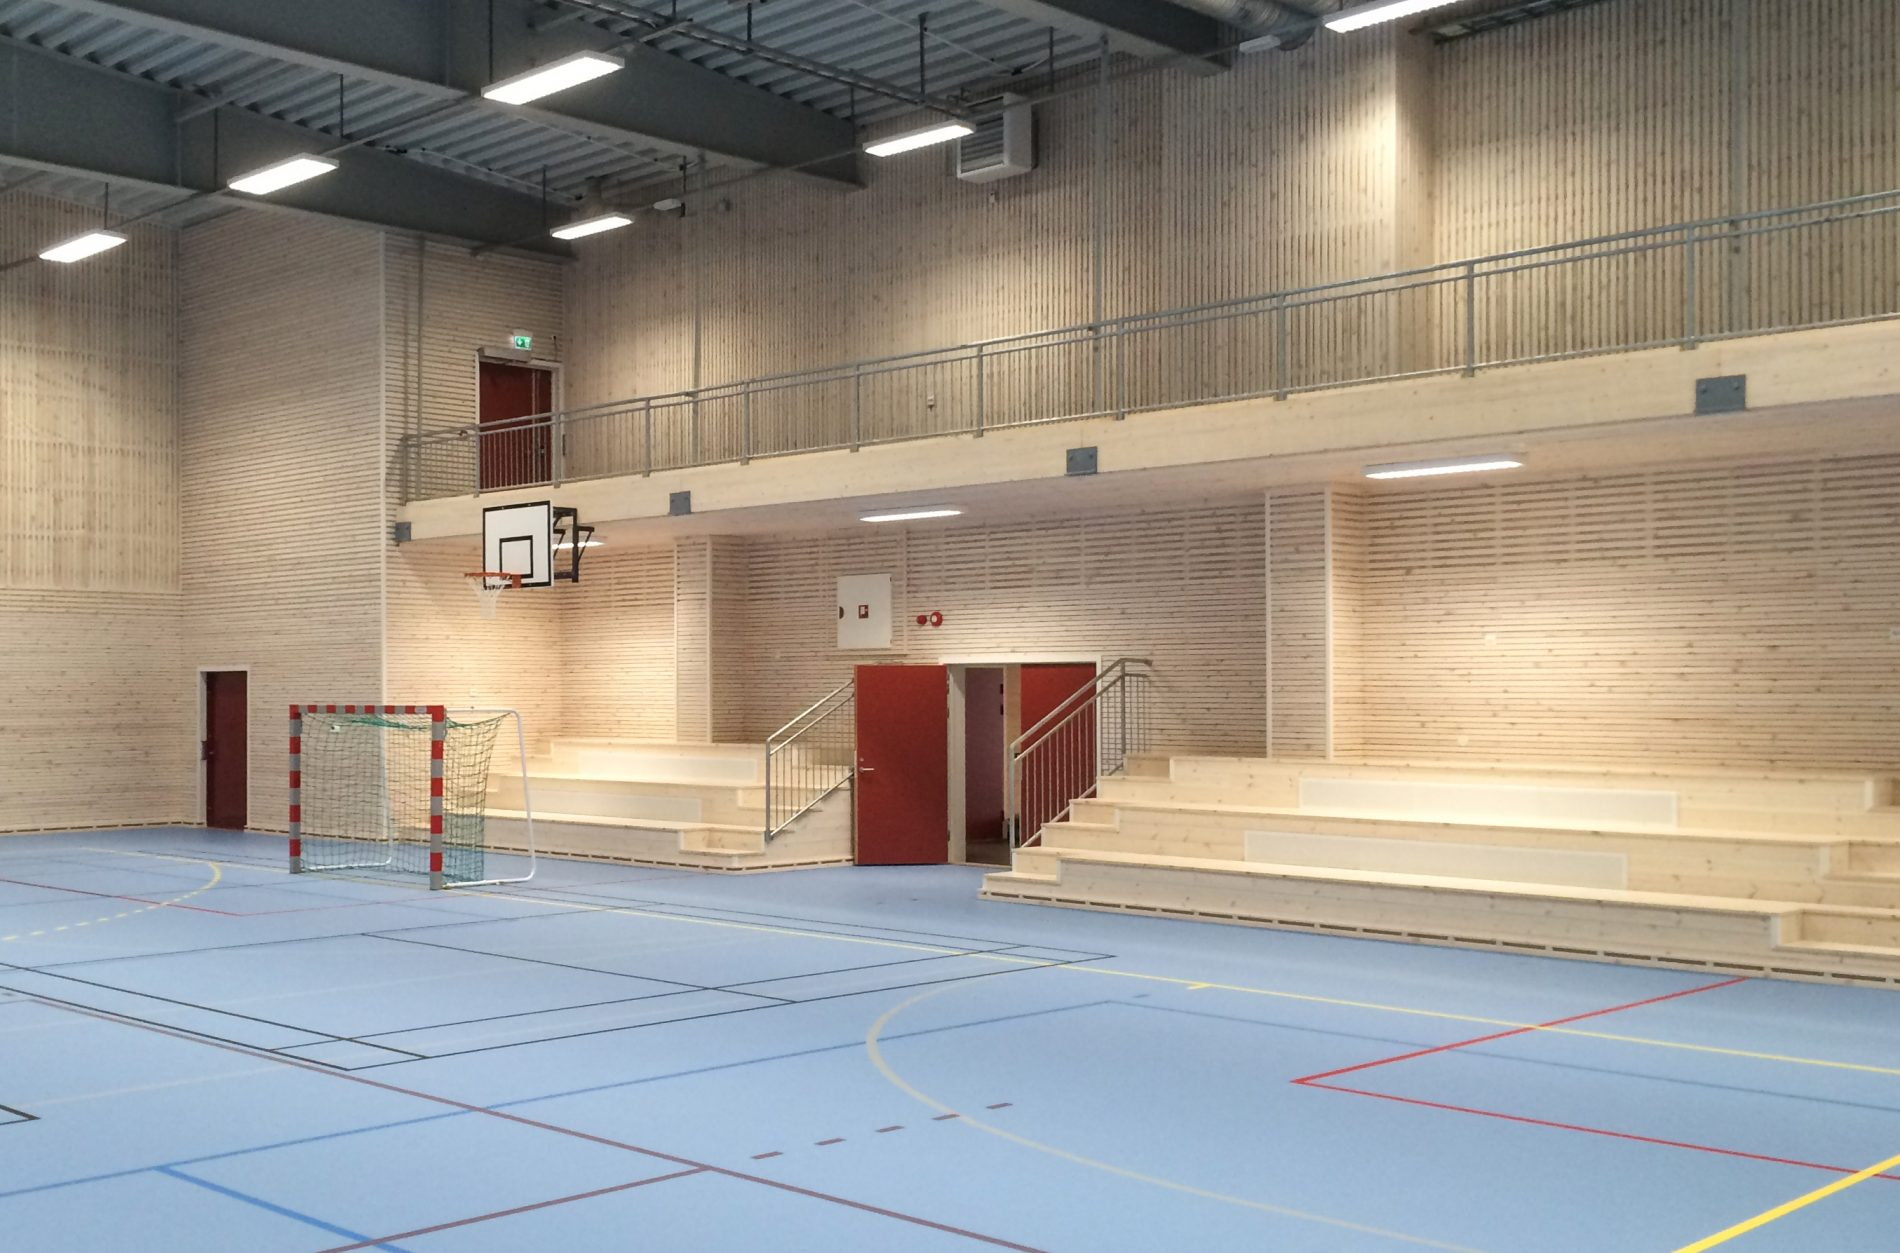 Bygland Idrettshall - Point Design